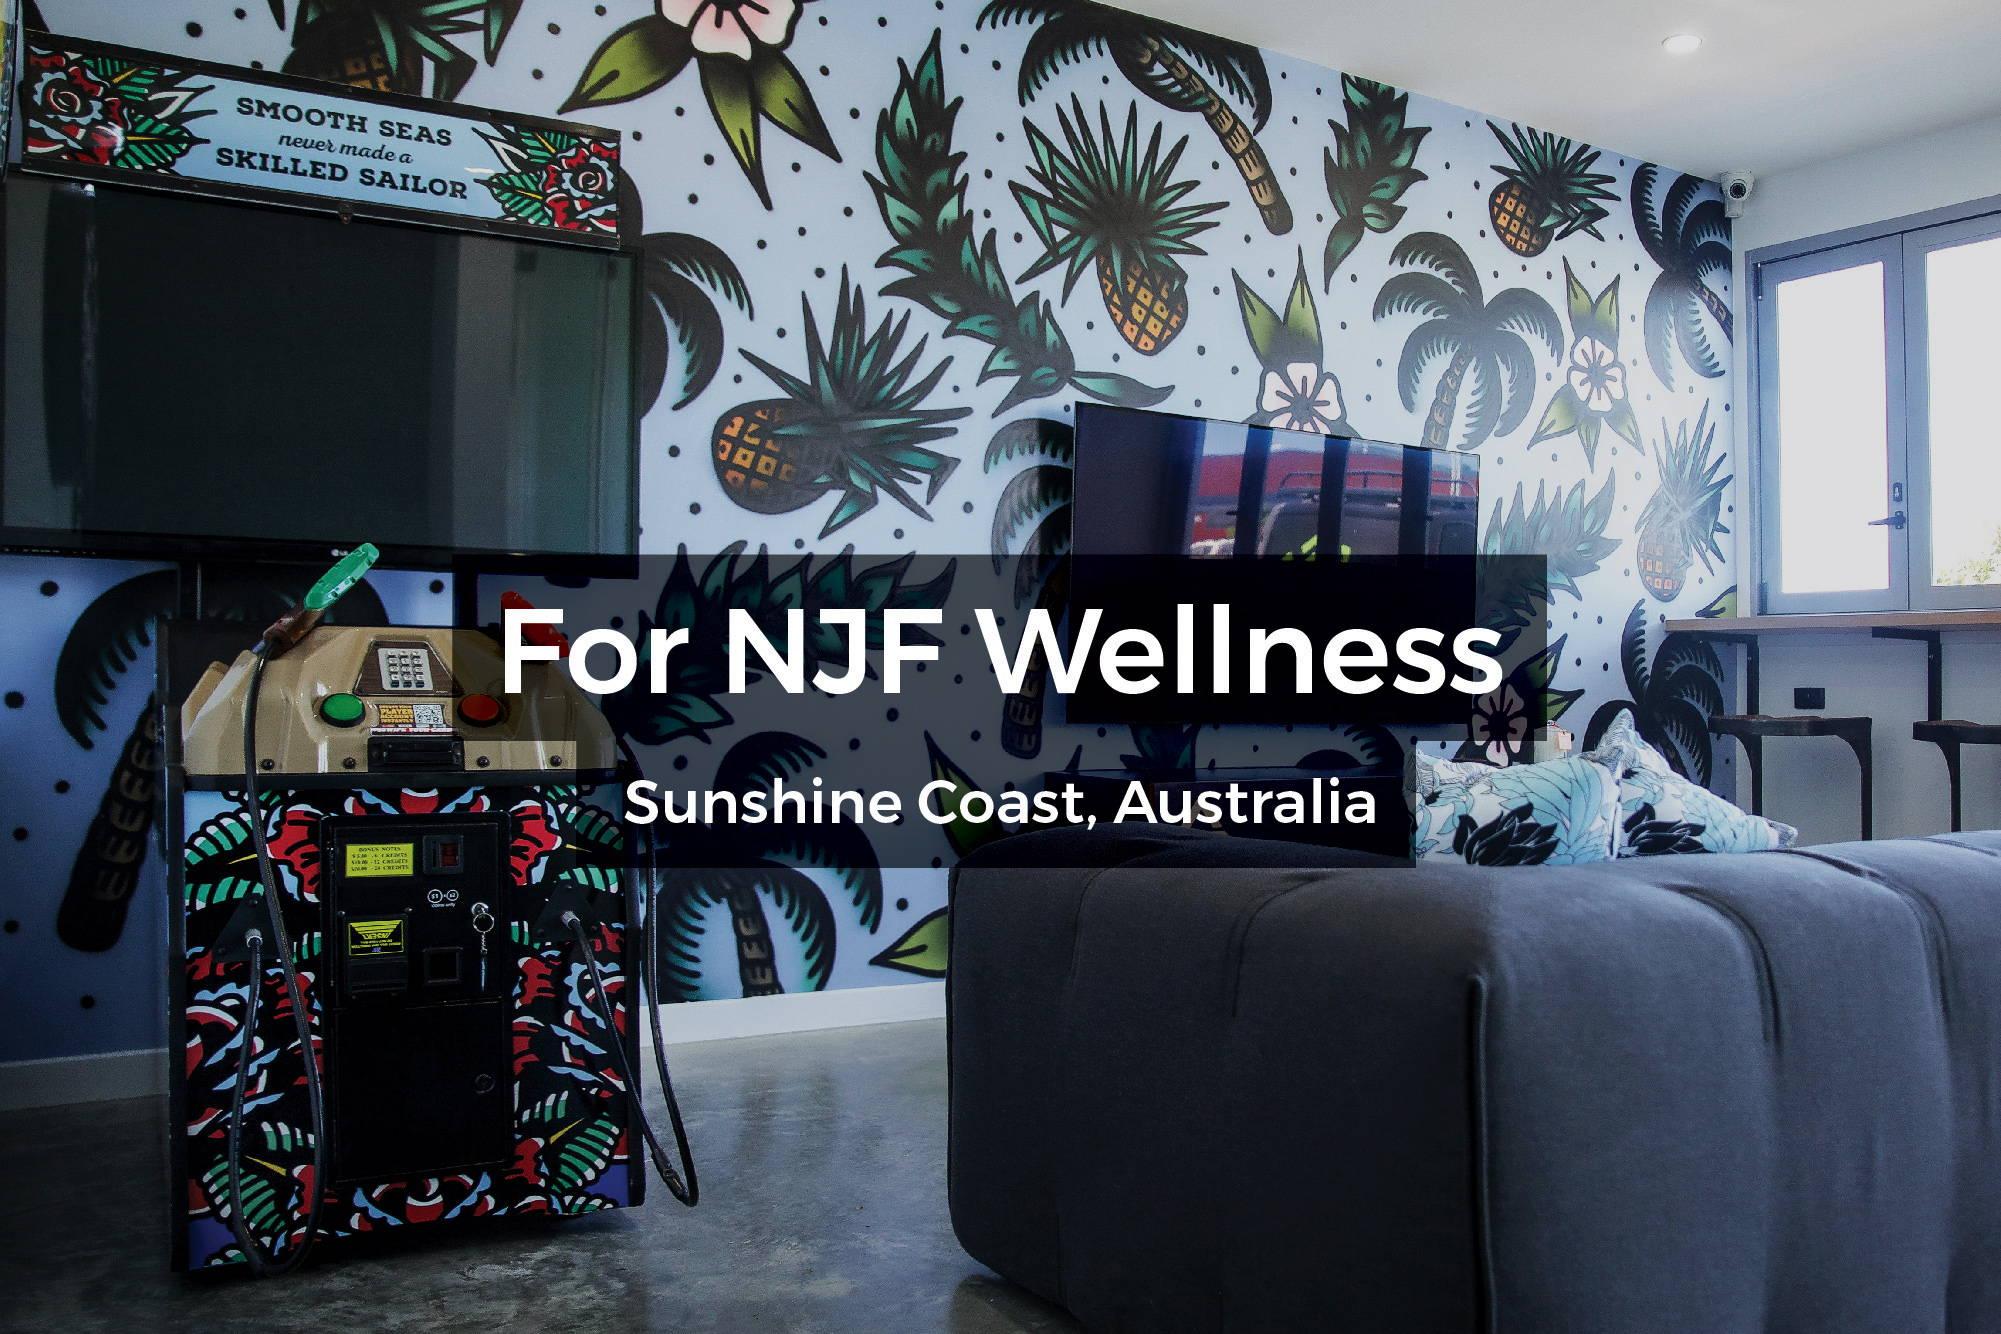 NJF Wellness Centre mural on the Sunshine Coast, Australia by Steen Jones